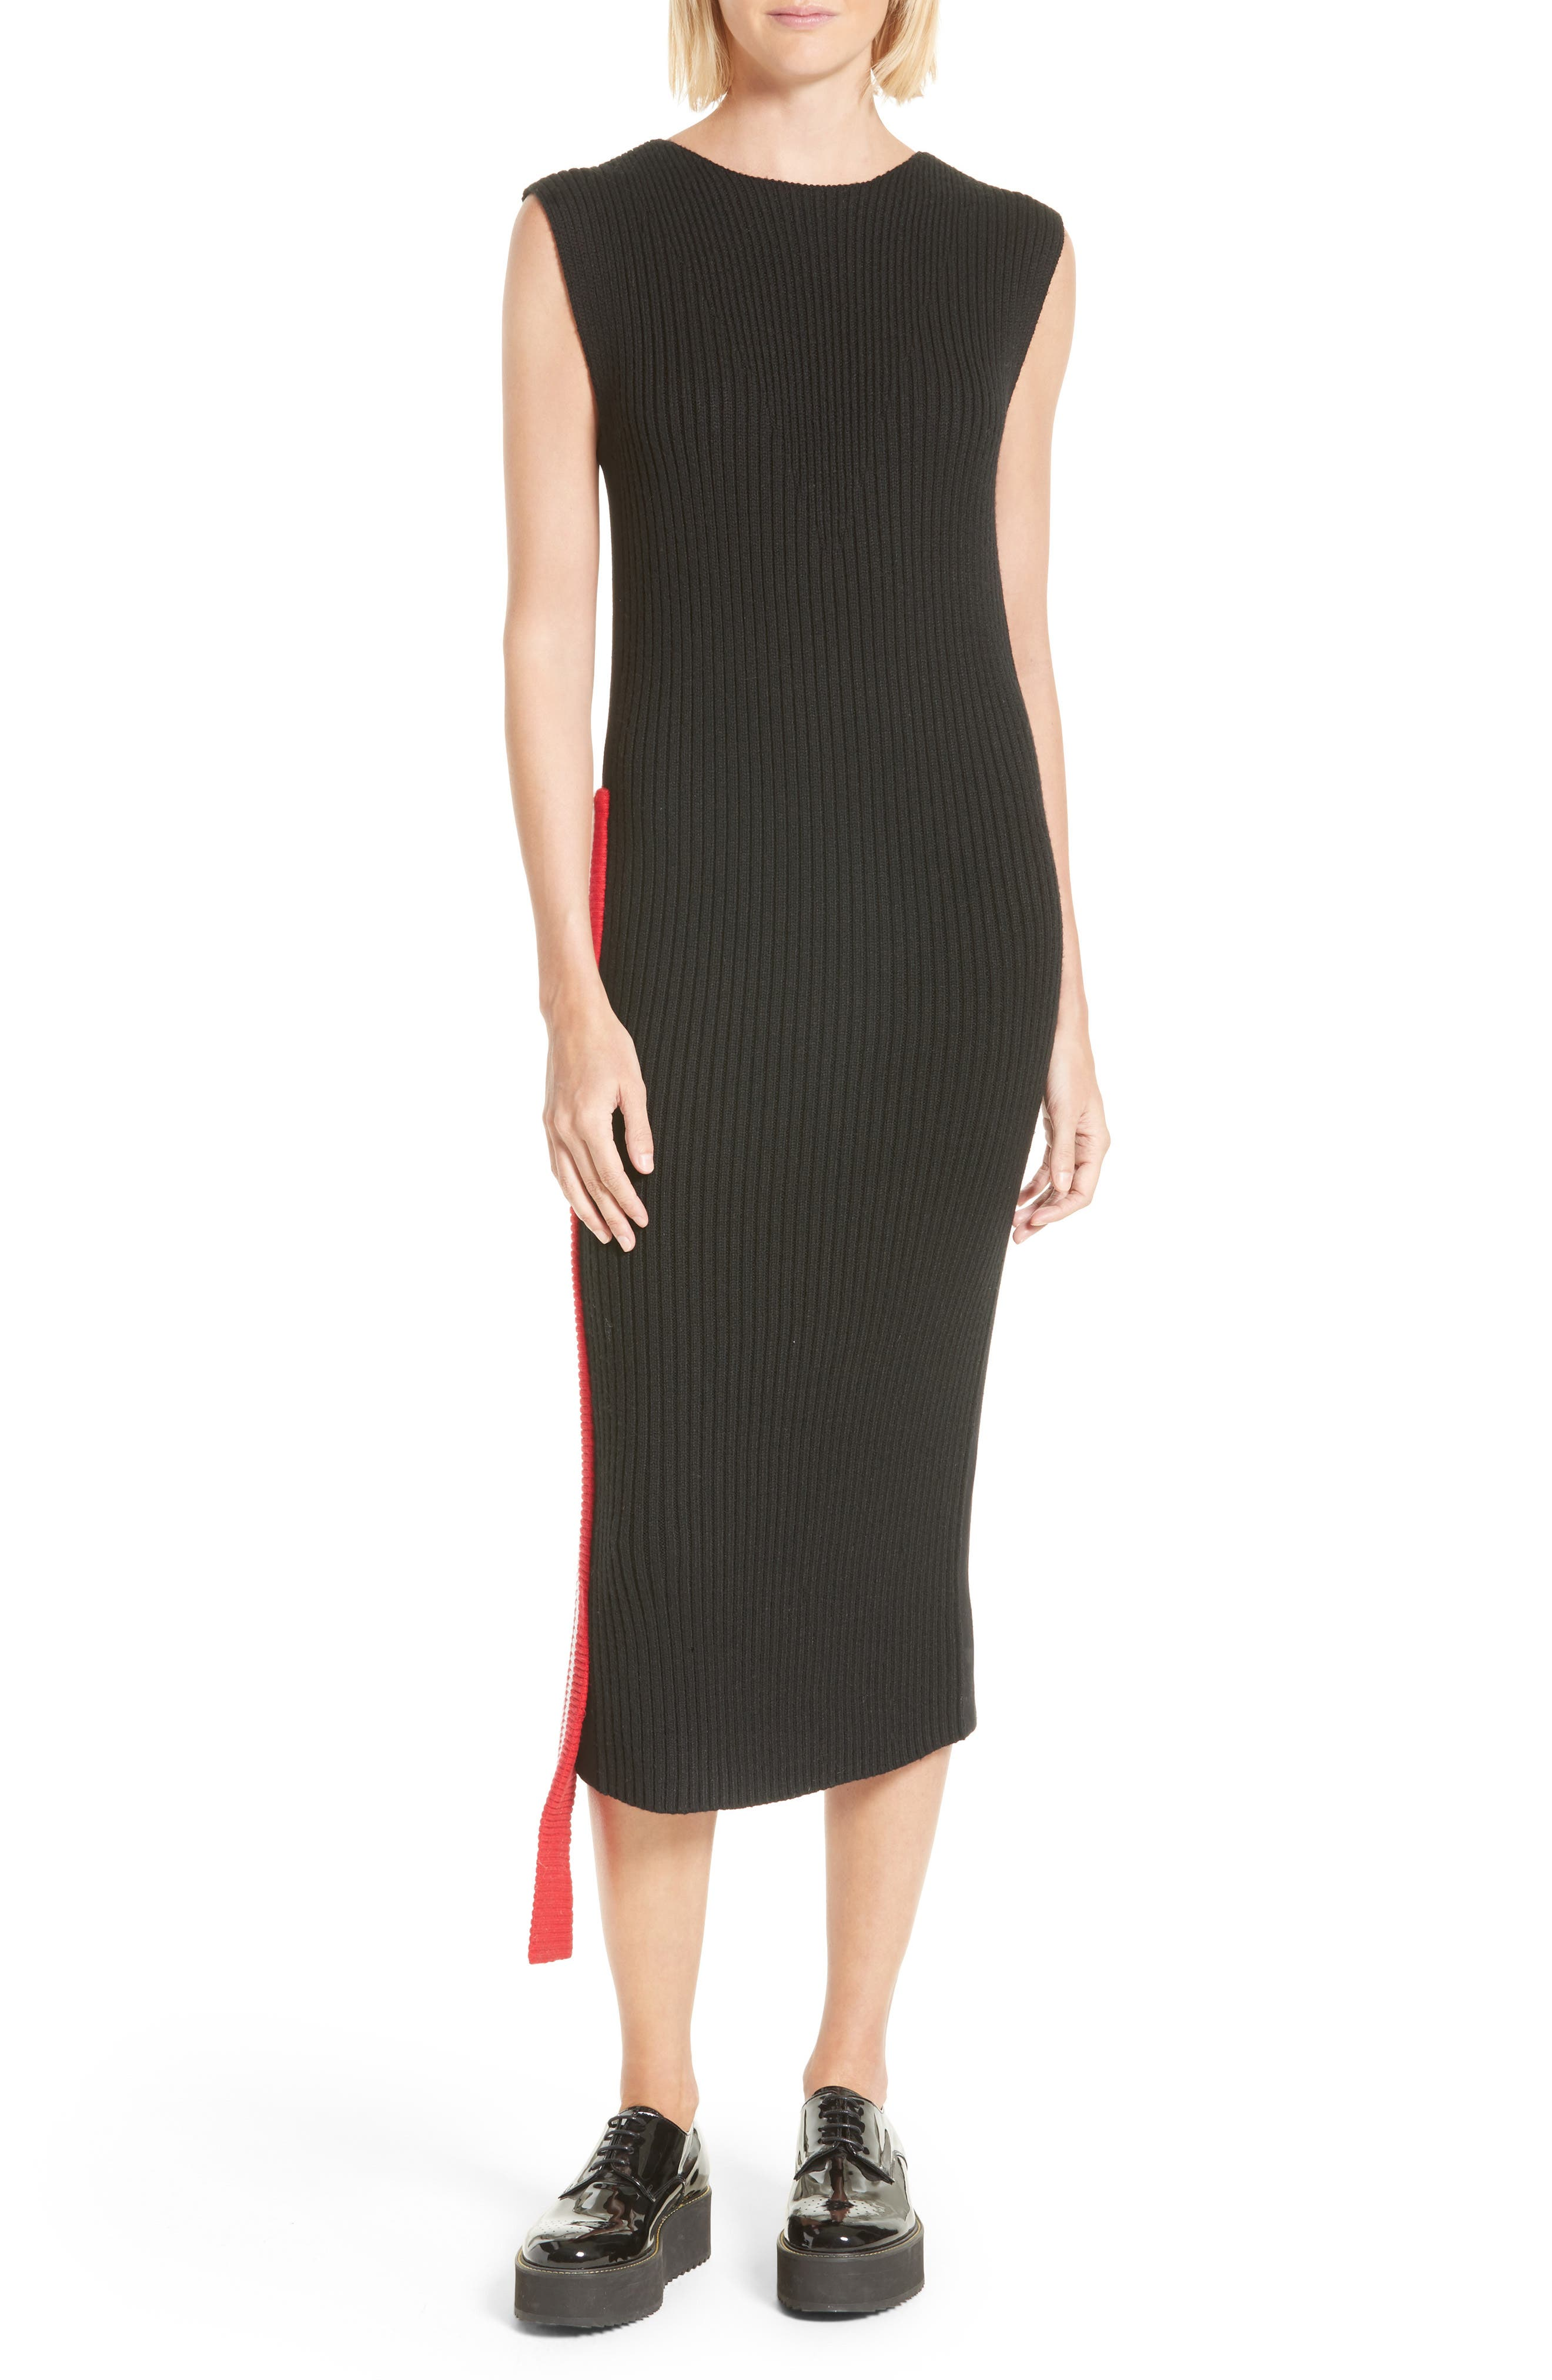 Alternate Image 1 Selected - Public School Serat Stripe Rib Knit Dress